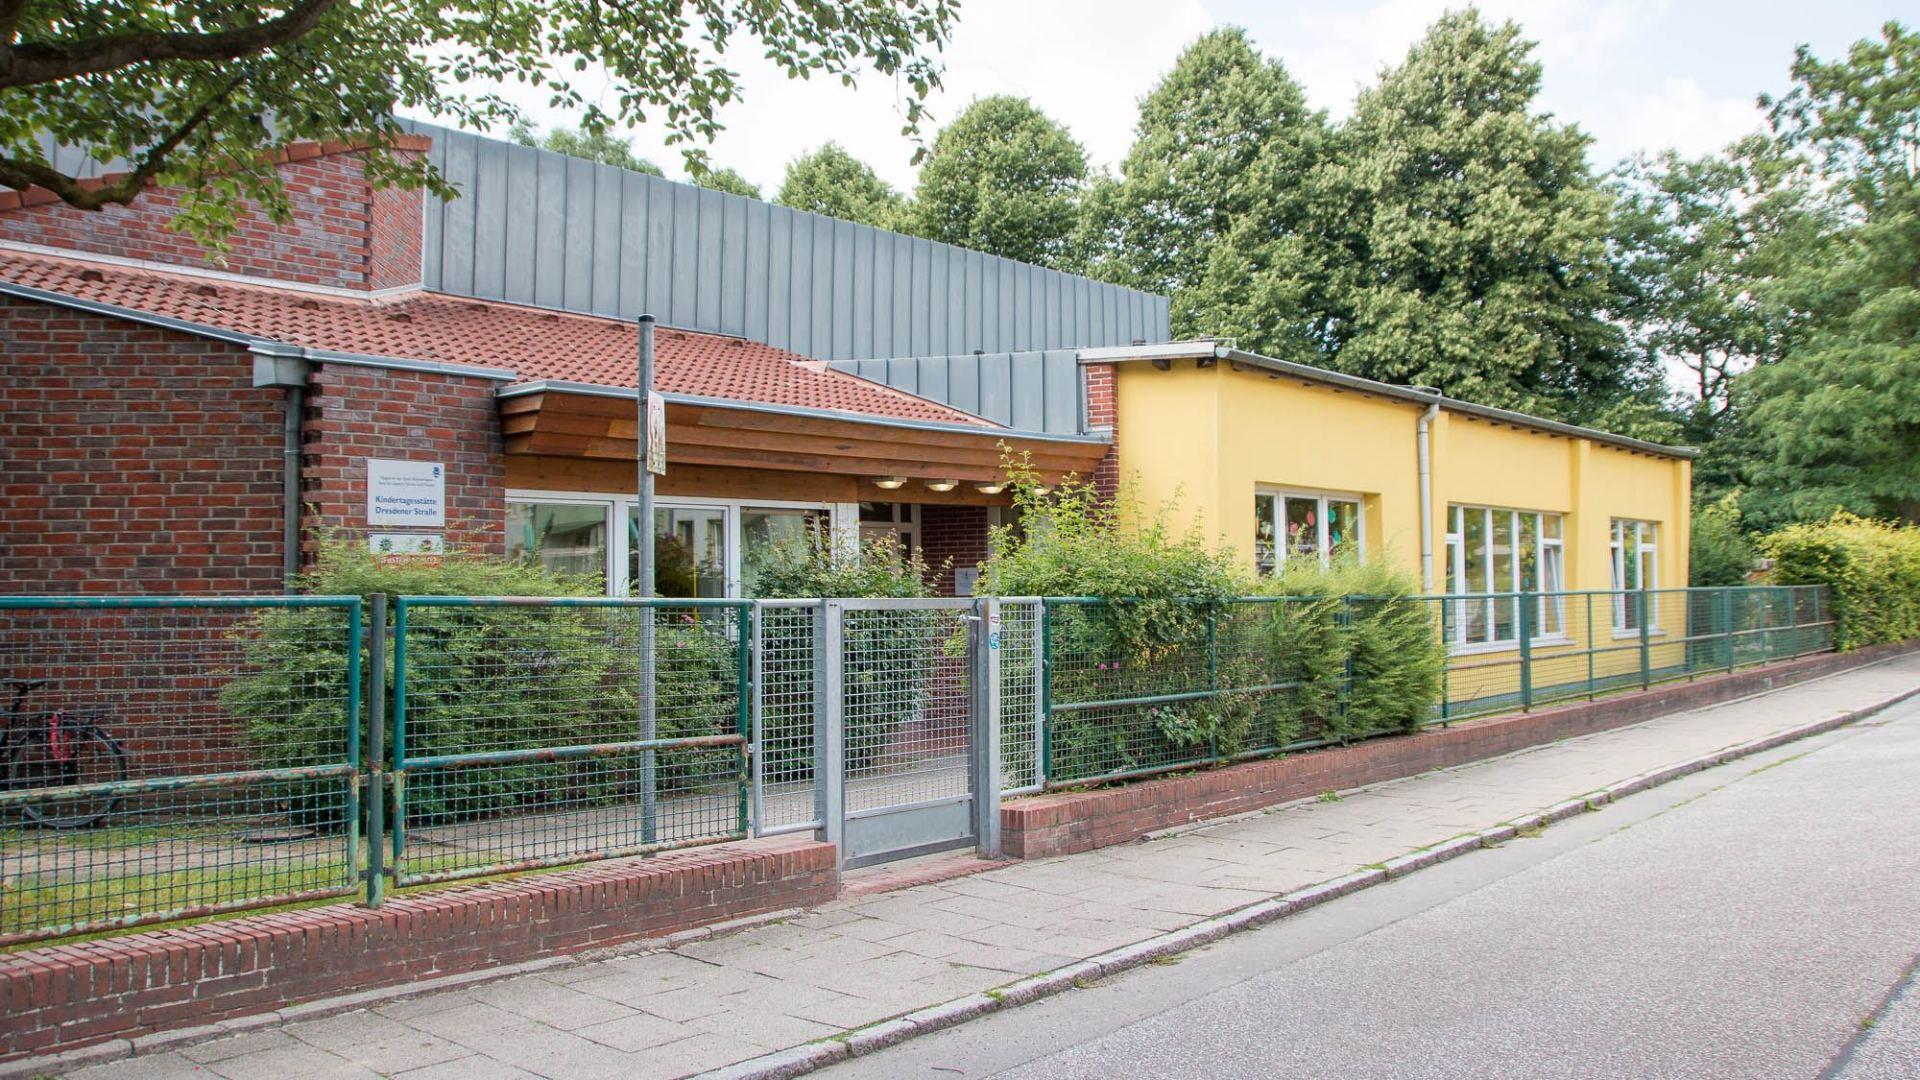 Kindertagesstätte Dresdener Straße – Bremerhaven.de